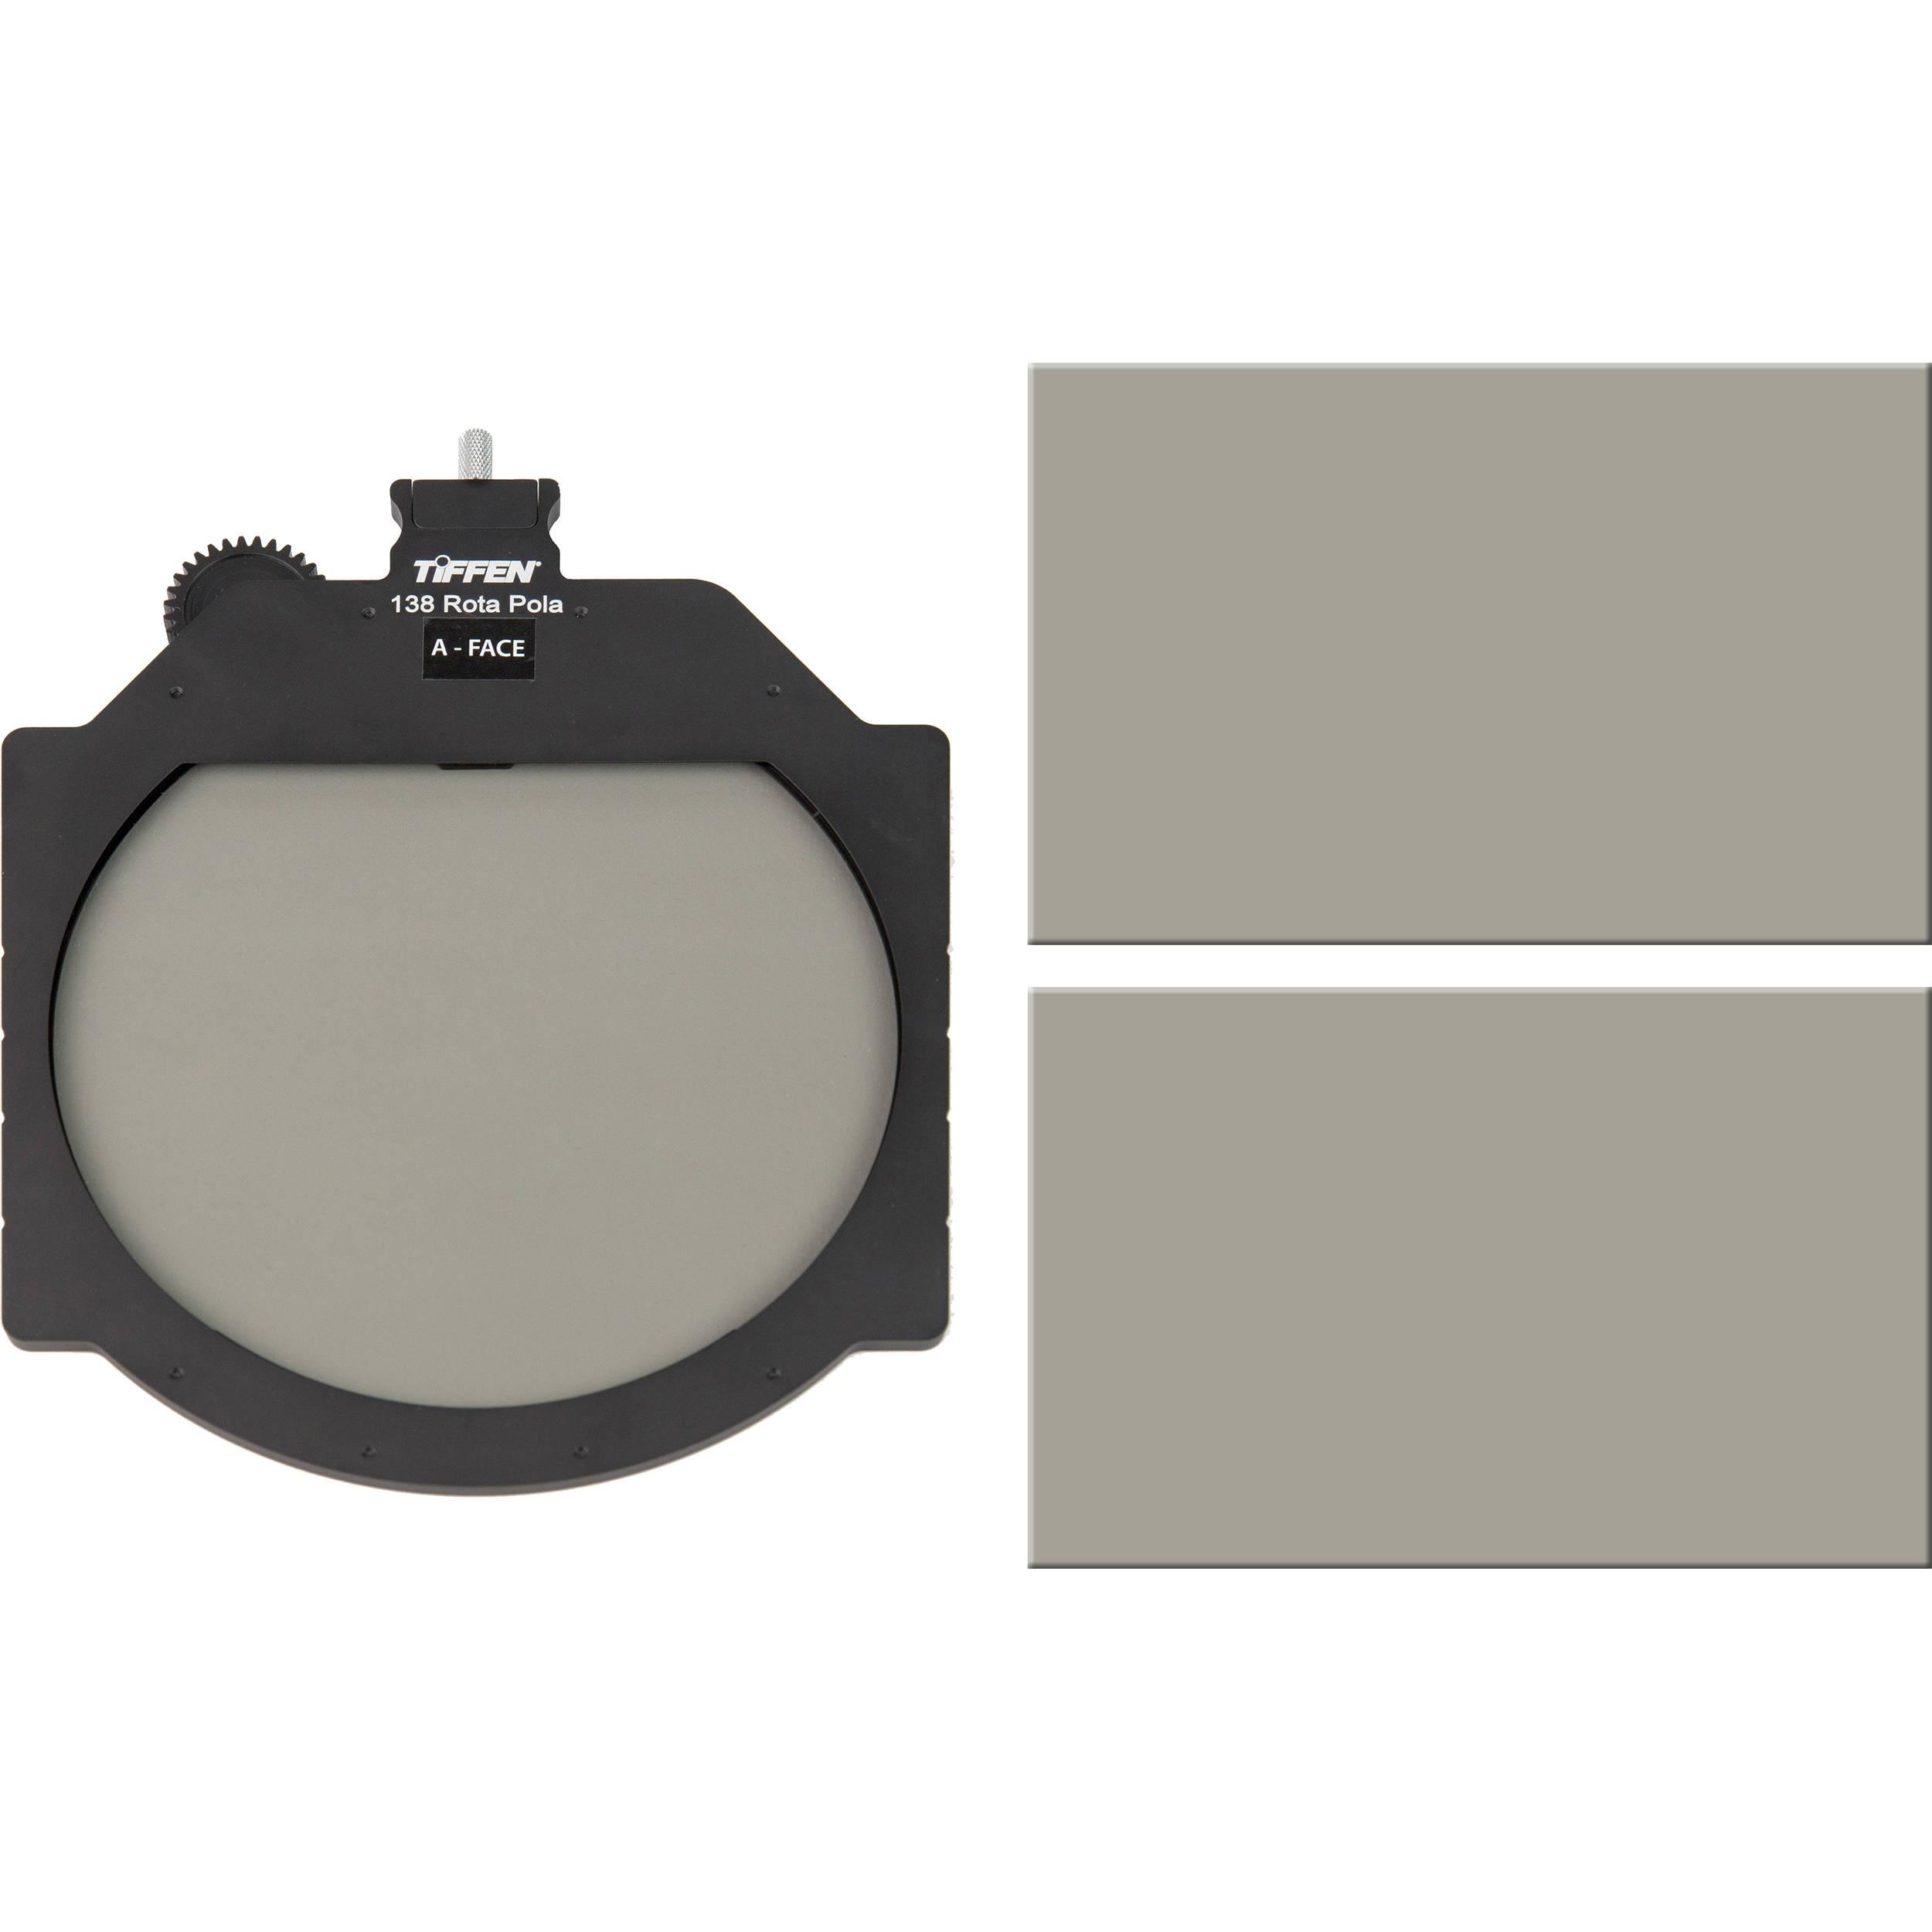 "Tiffen Multi Rota Tray Variable Neutral Density Kit with Extra 4x5.65"" Circular Polarizer"